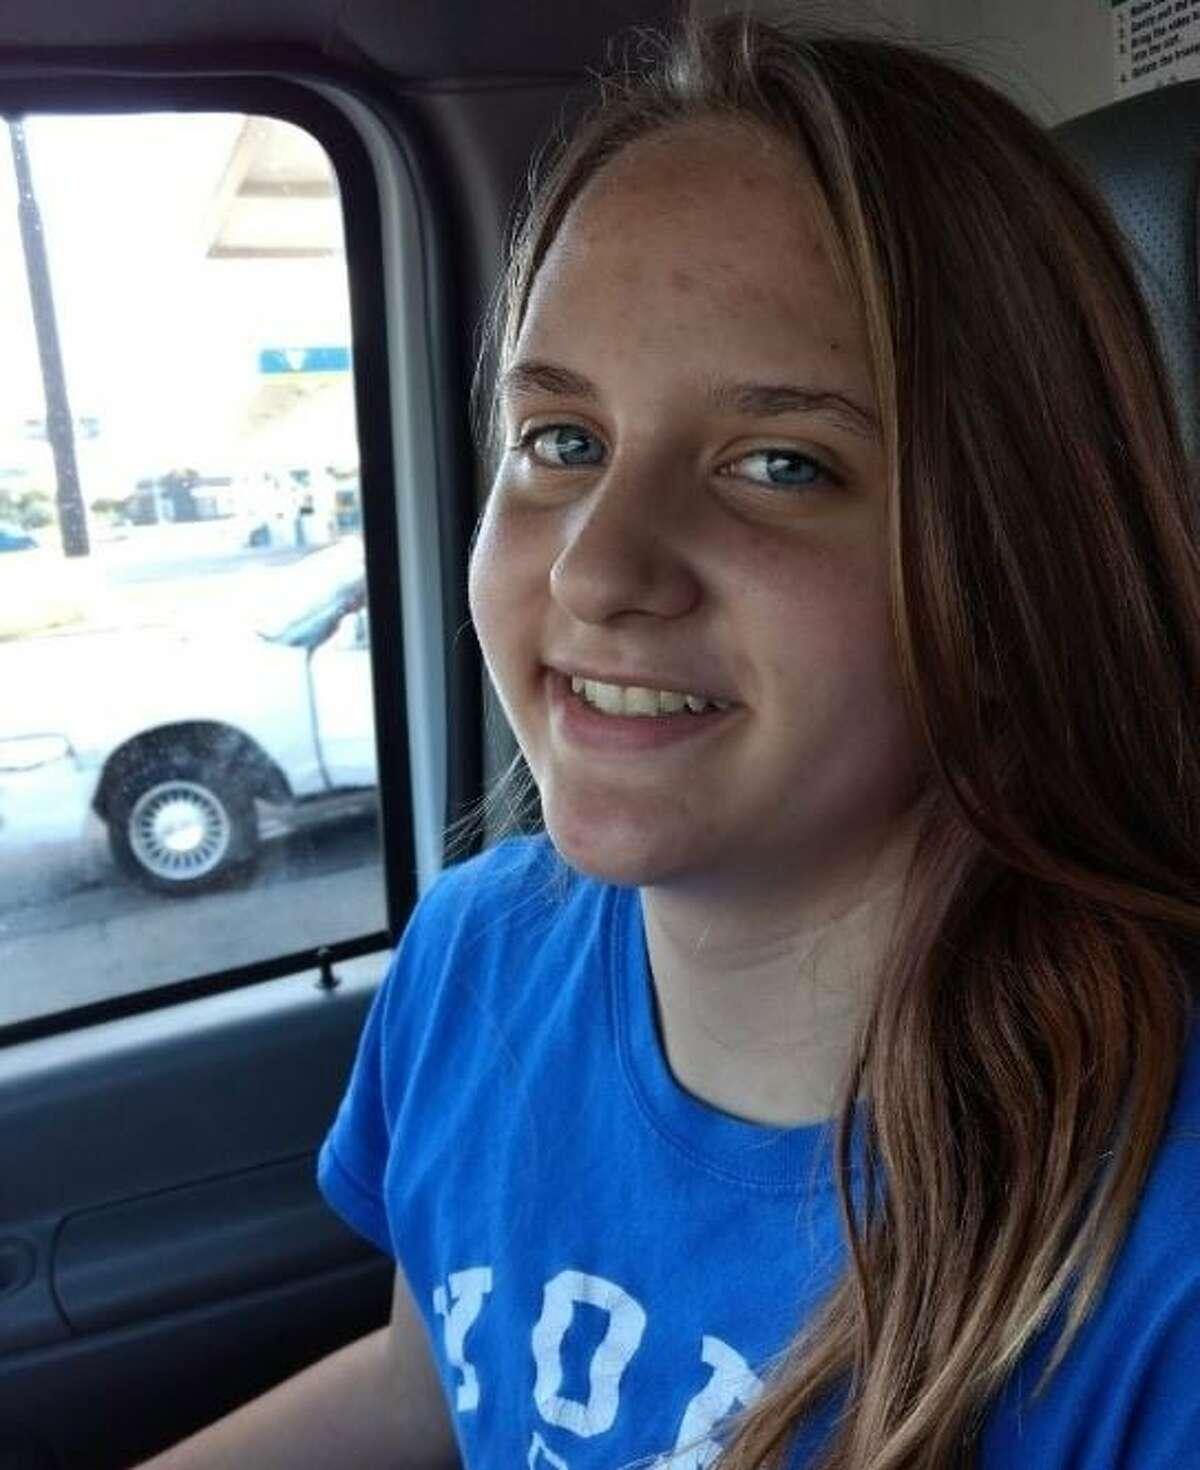 Mackenzie Tubbs, 14, was last seen on Jan. 28.